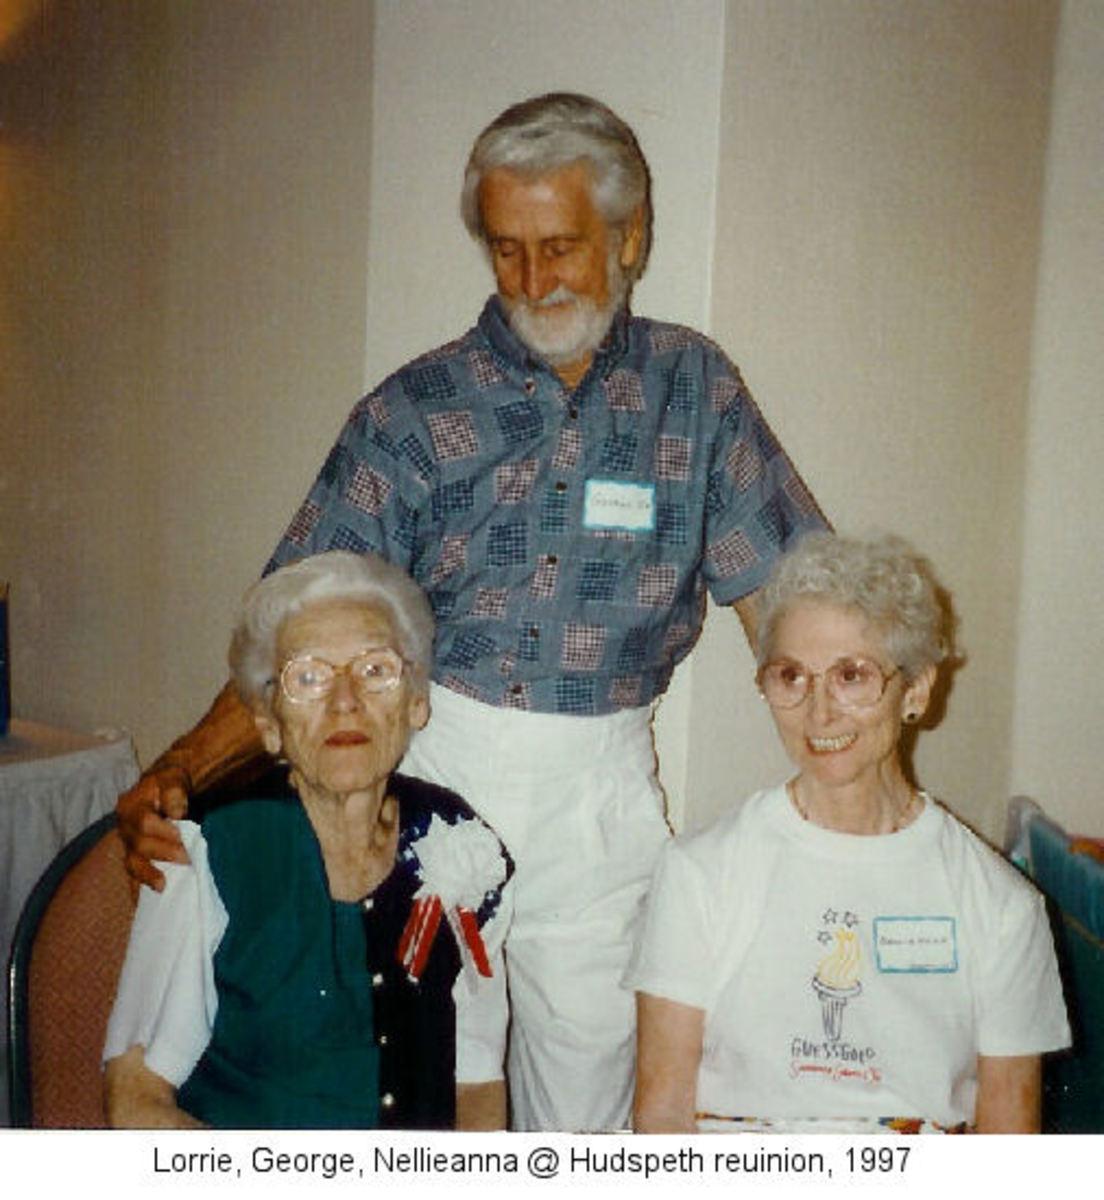 Lorrie, husband George, Nellieanna, 1997.